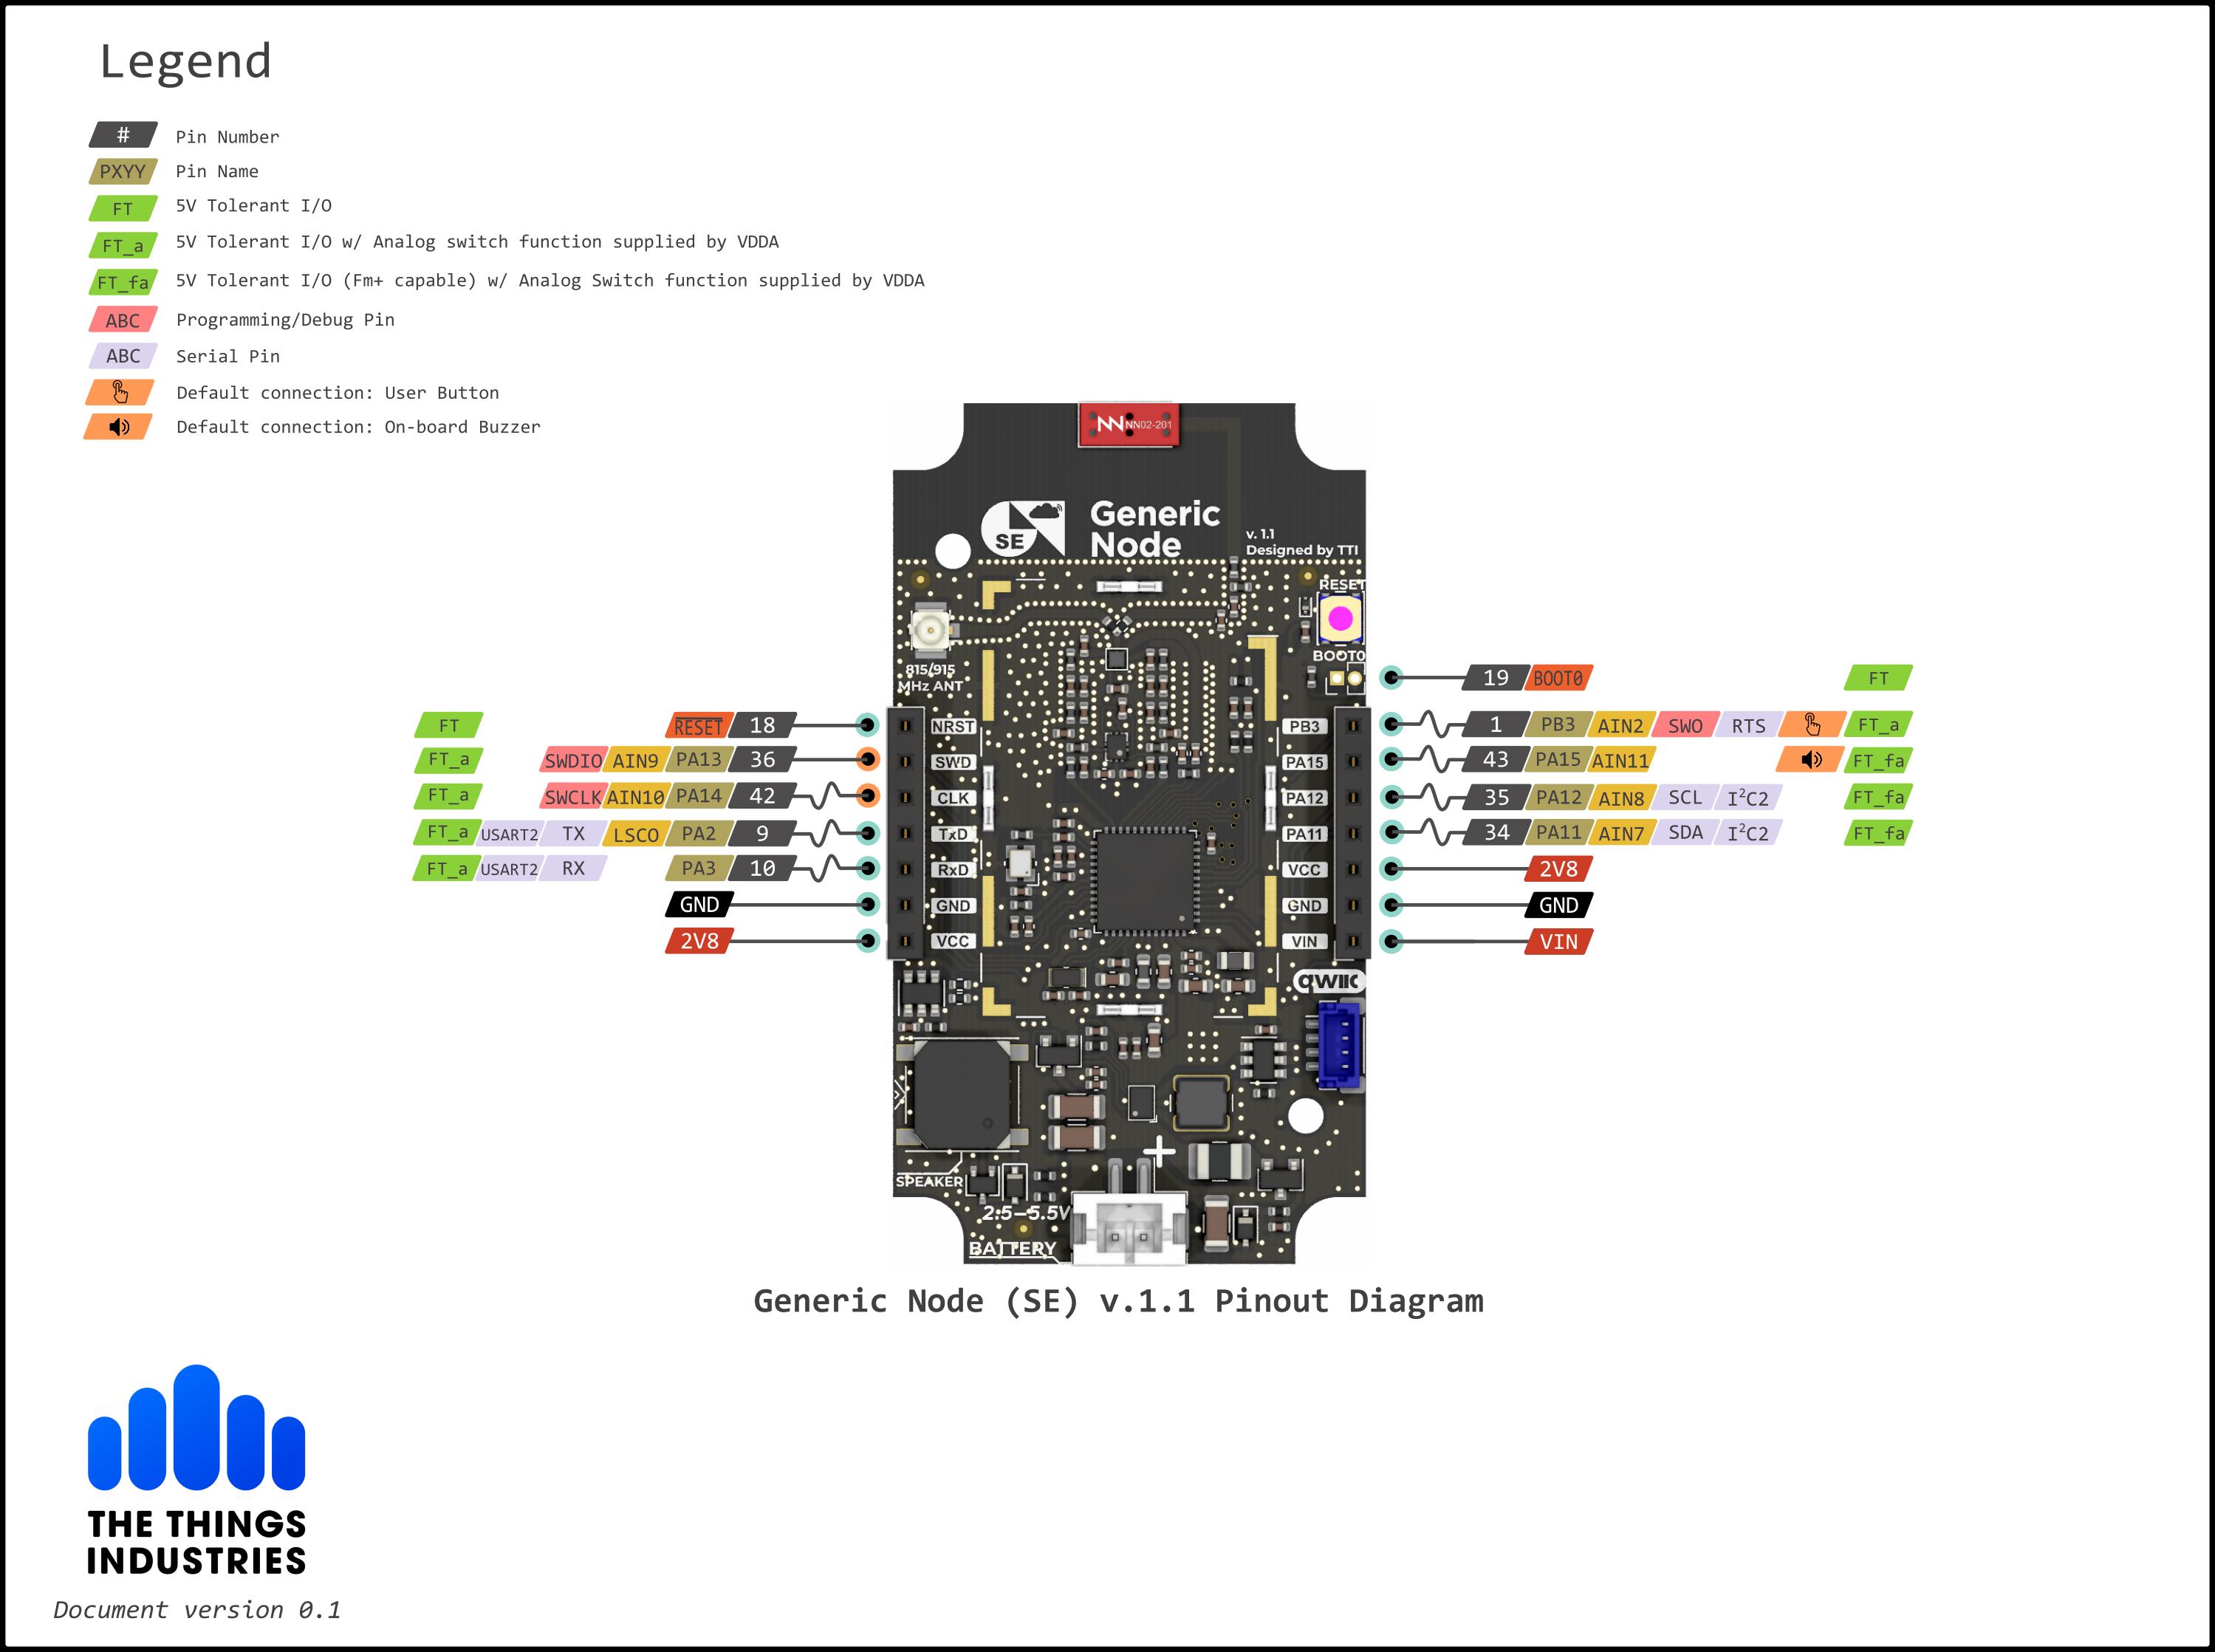 GNSE_v1.1_pinout